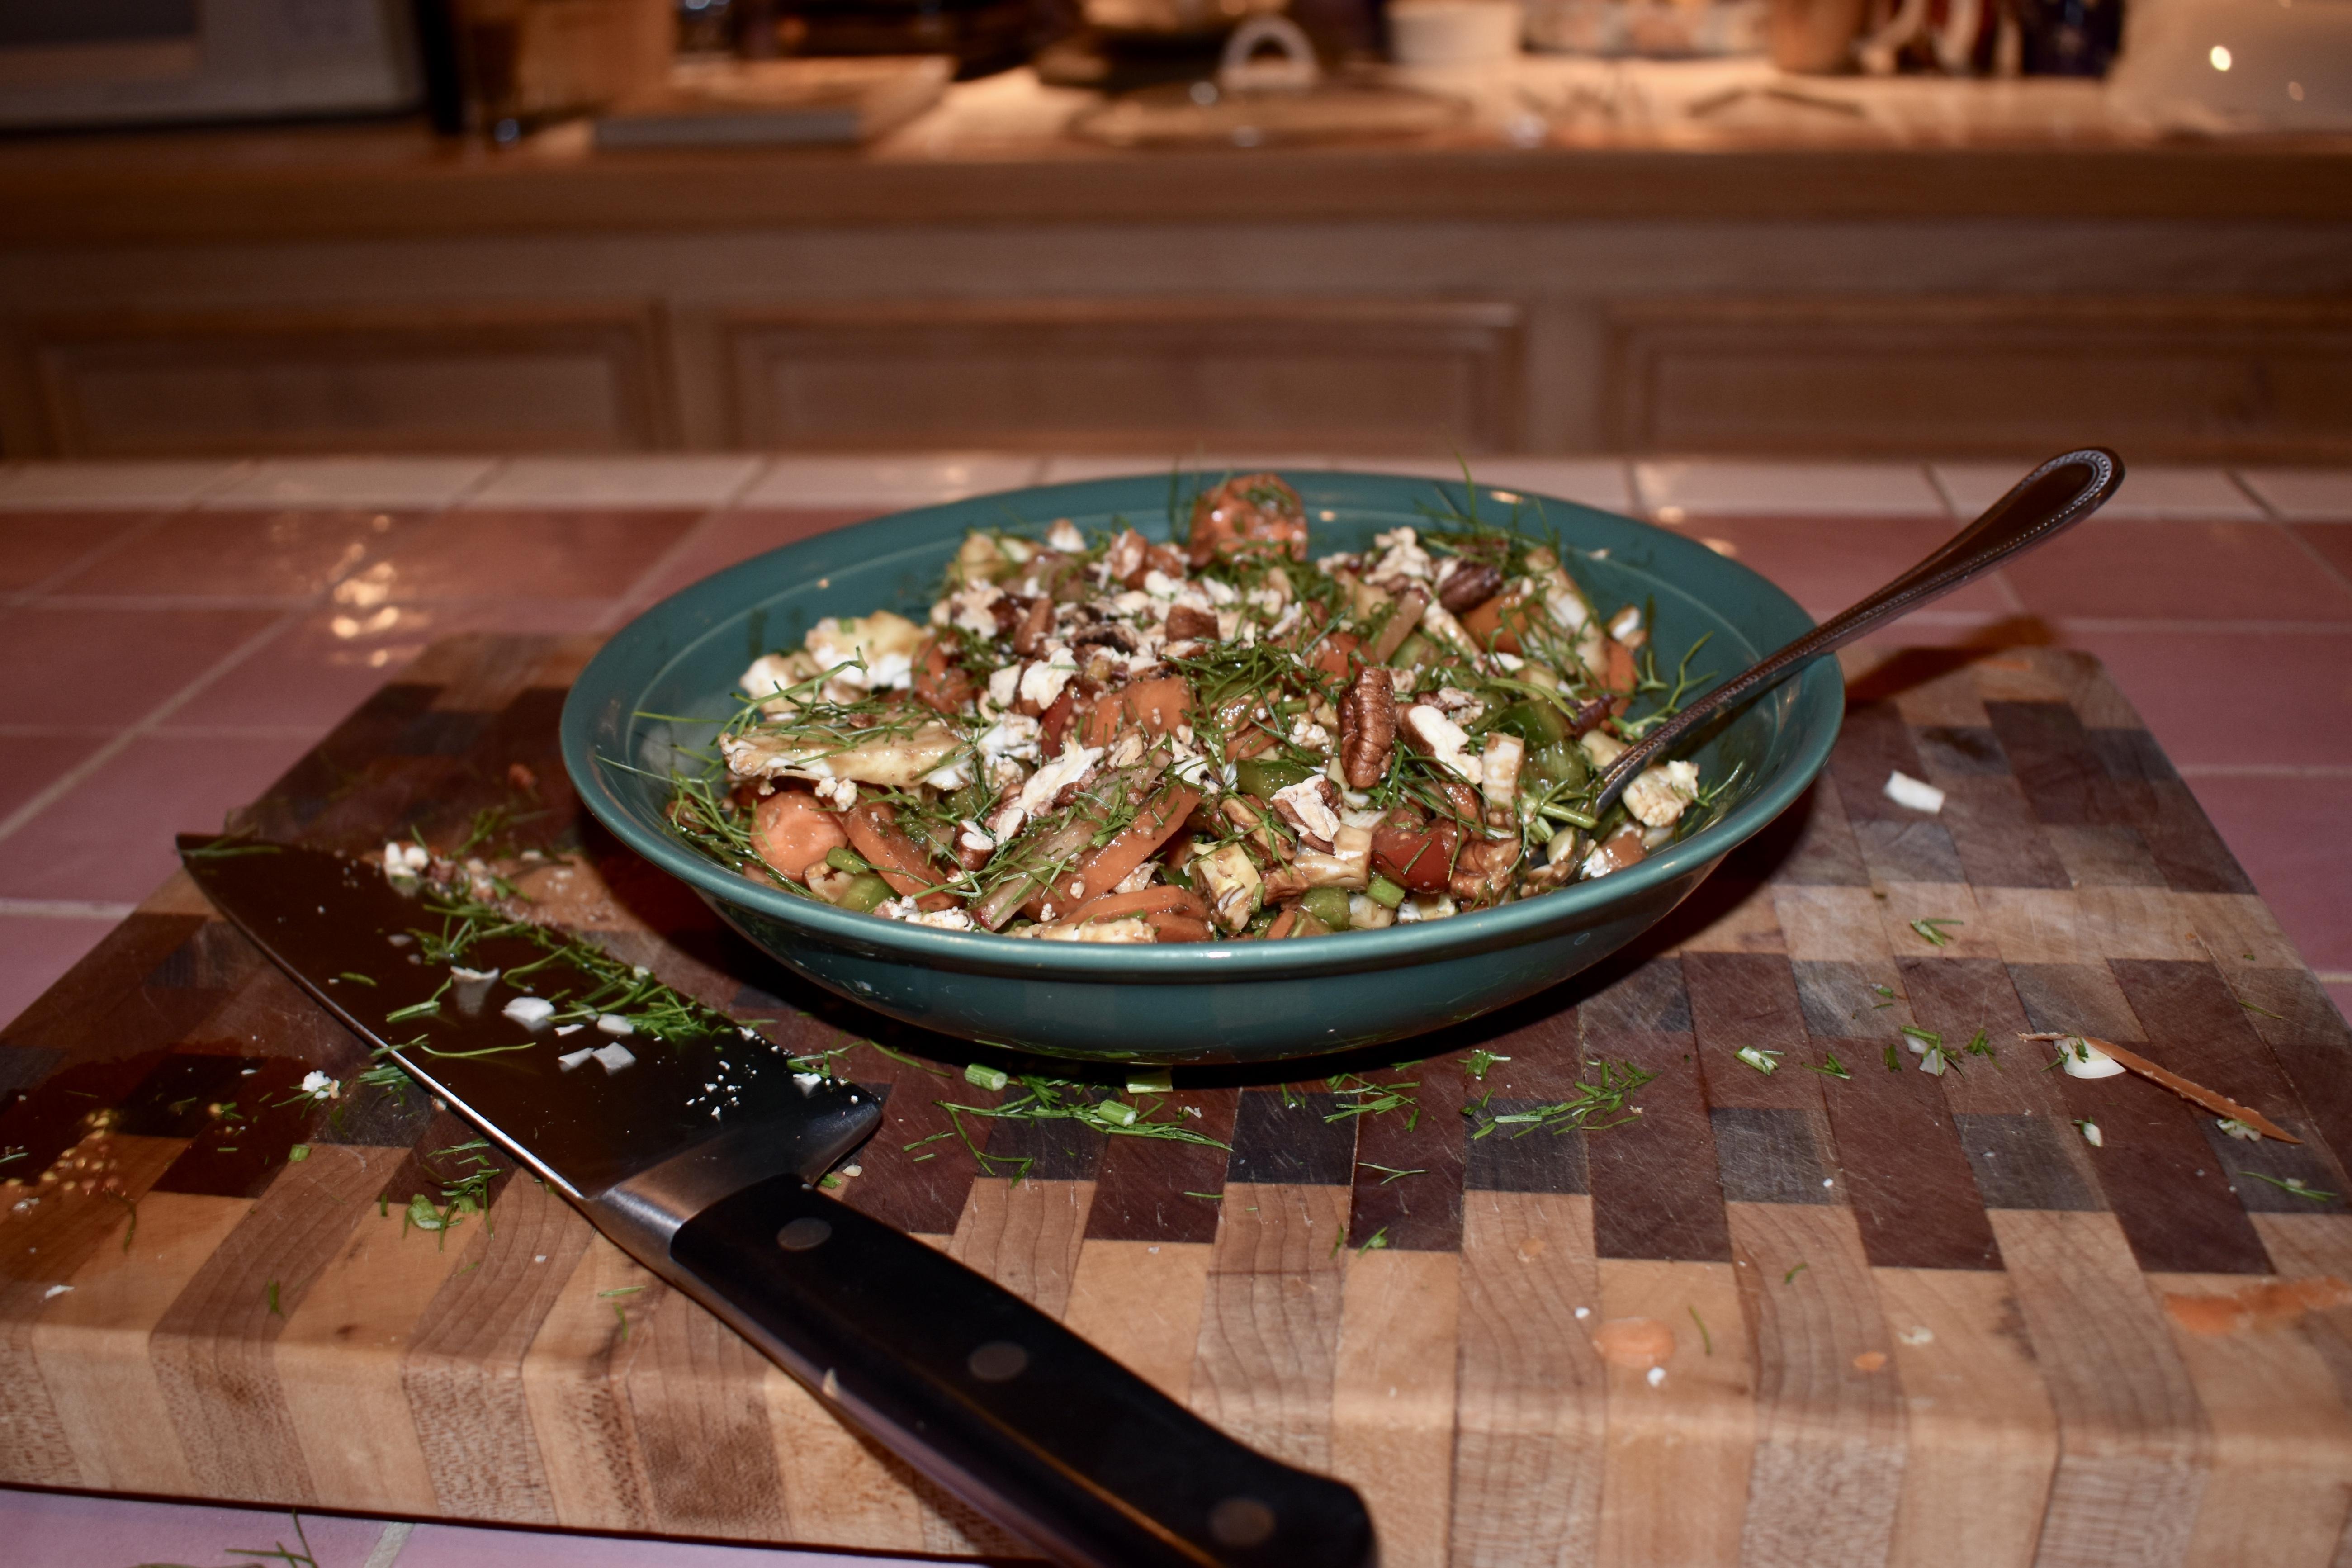 Root Vegetable Salad with 3-1-2 Balsamic Honey Dijon Dressing